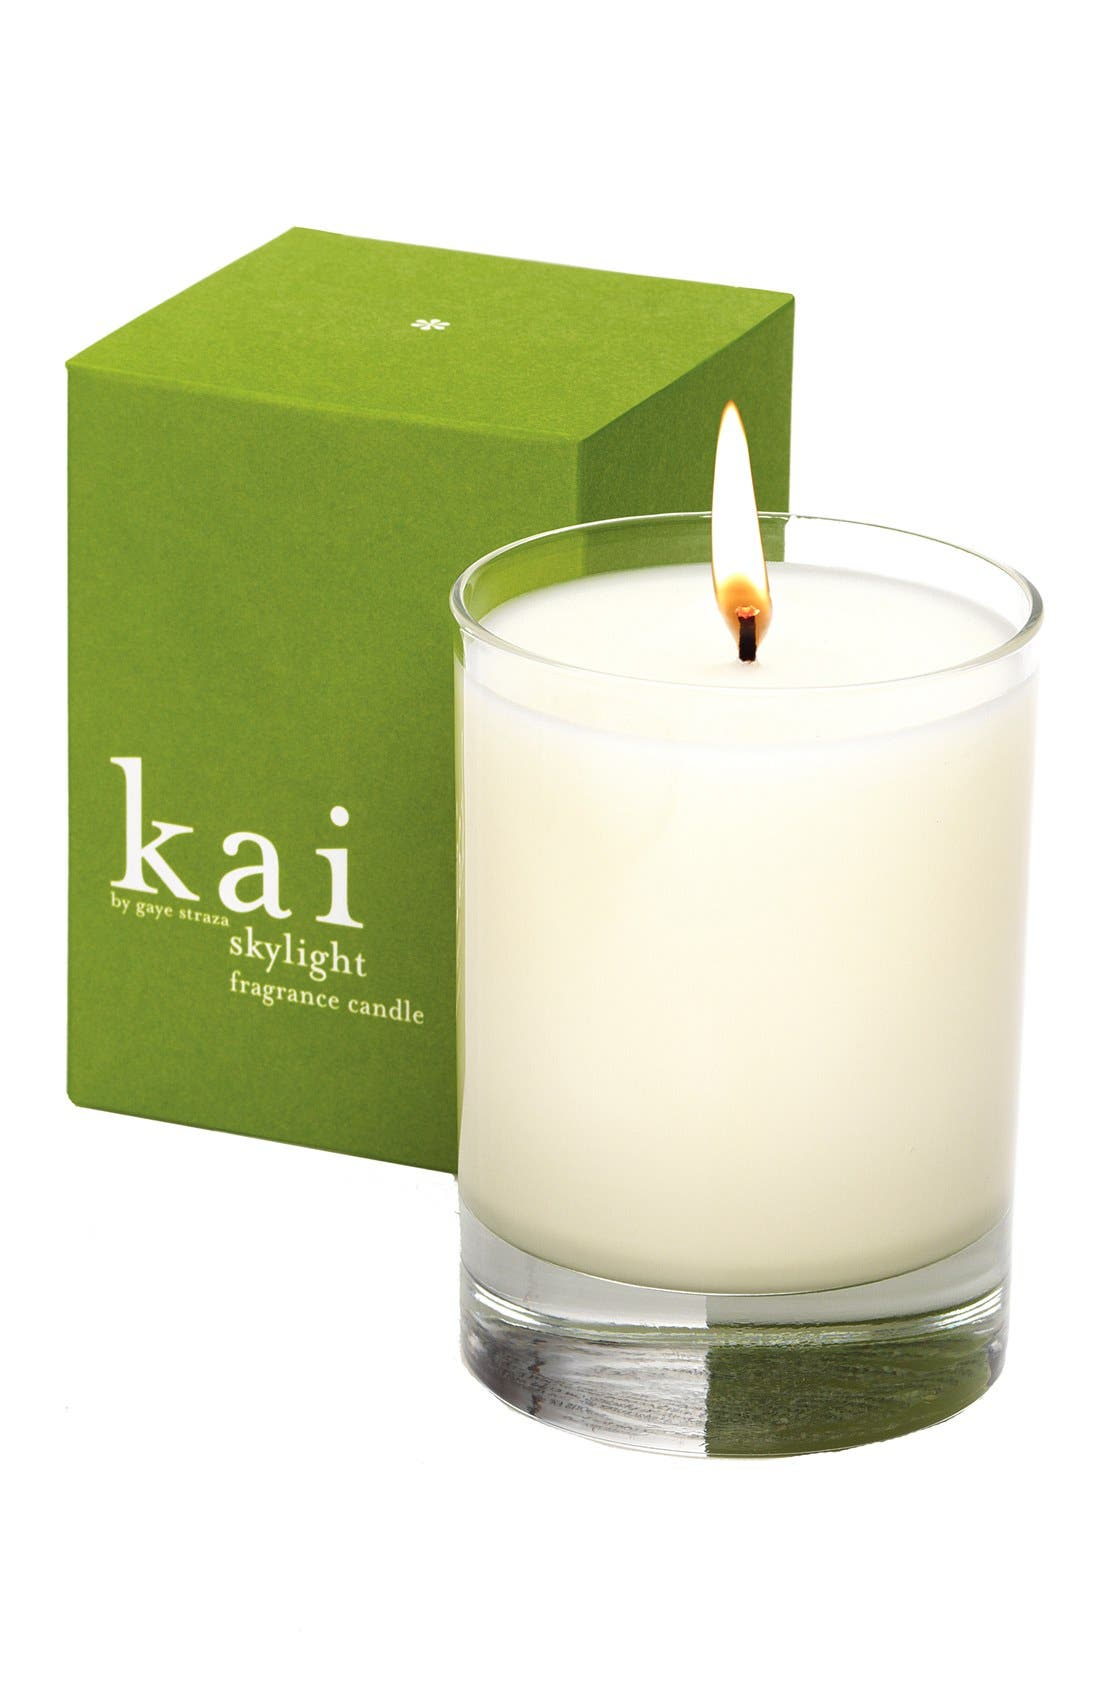 Main Image - kai 'Skylight' Fragrance Candle